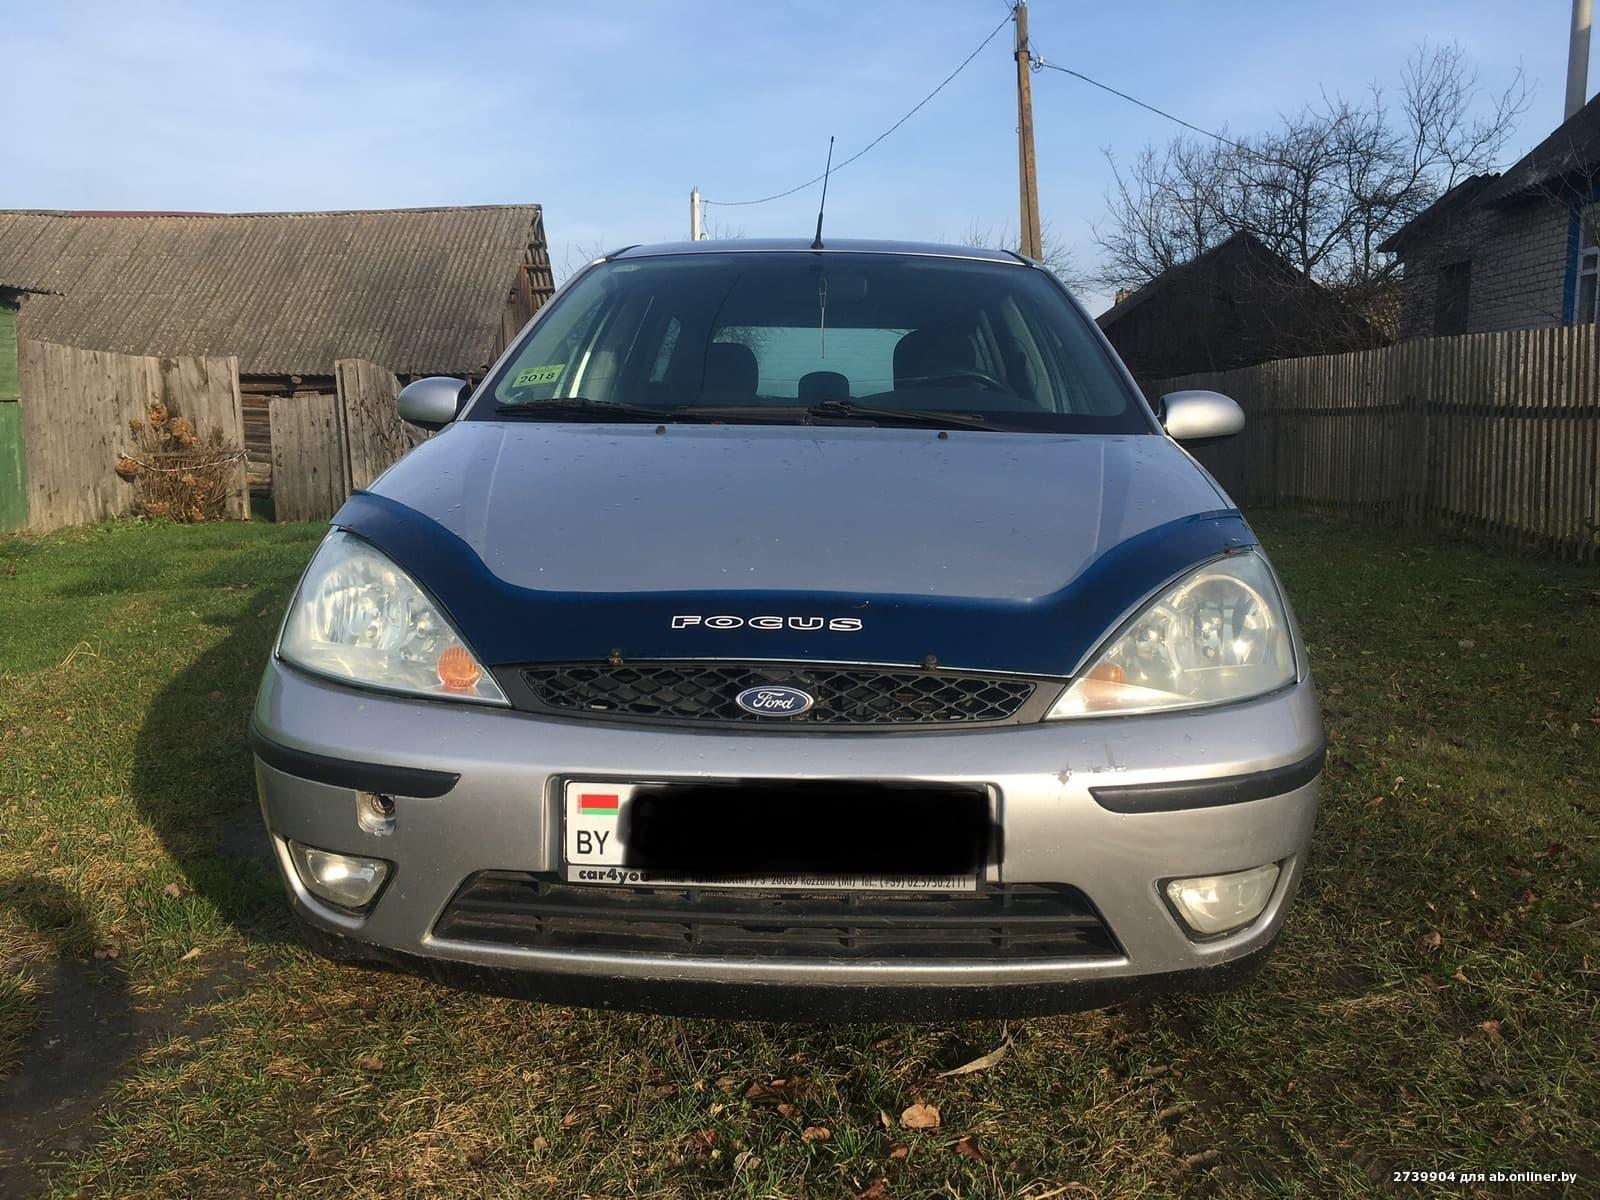 Ford Focus TDI